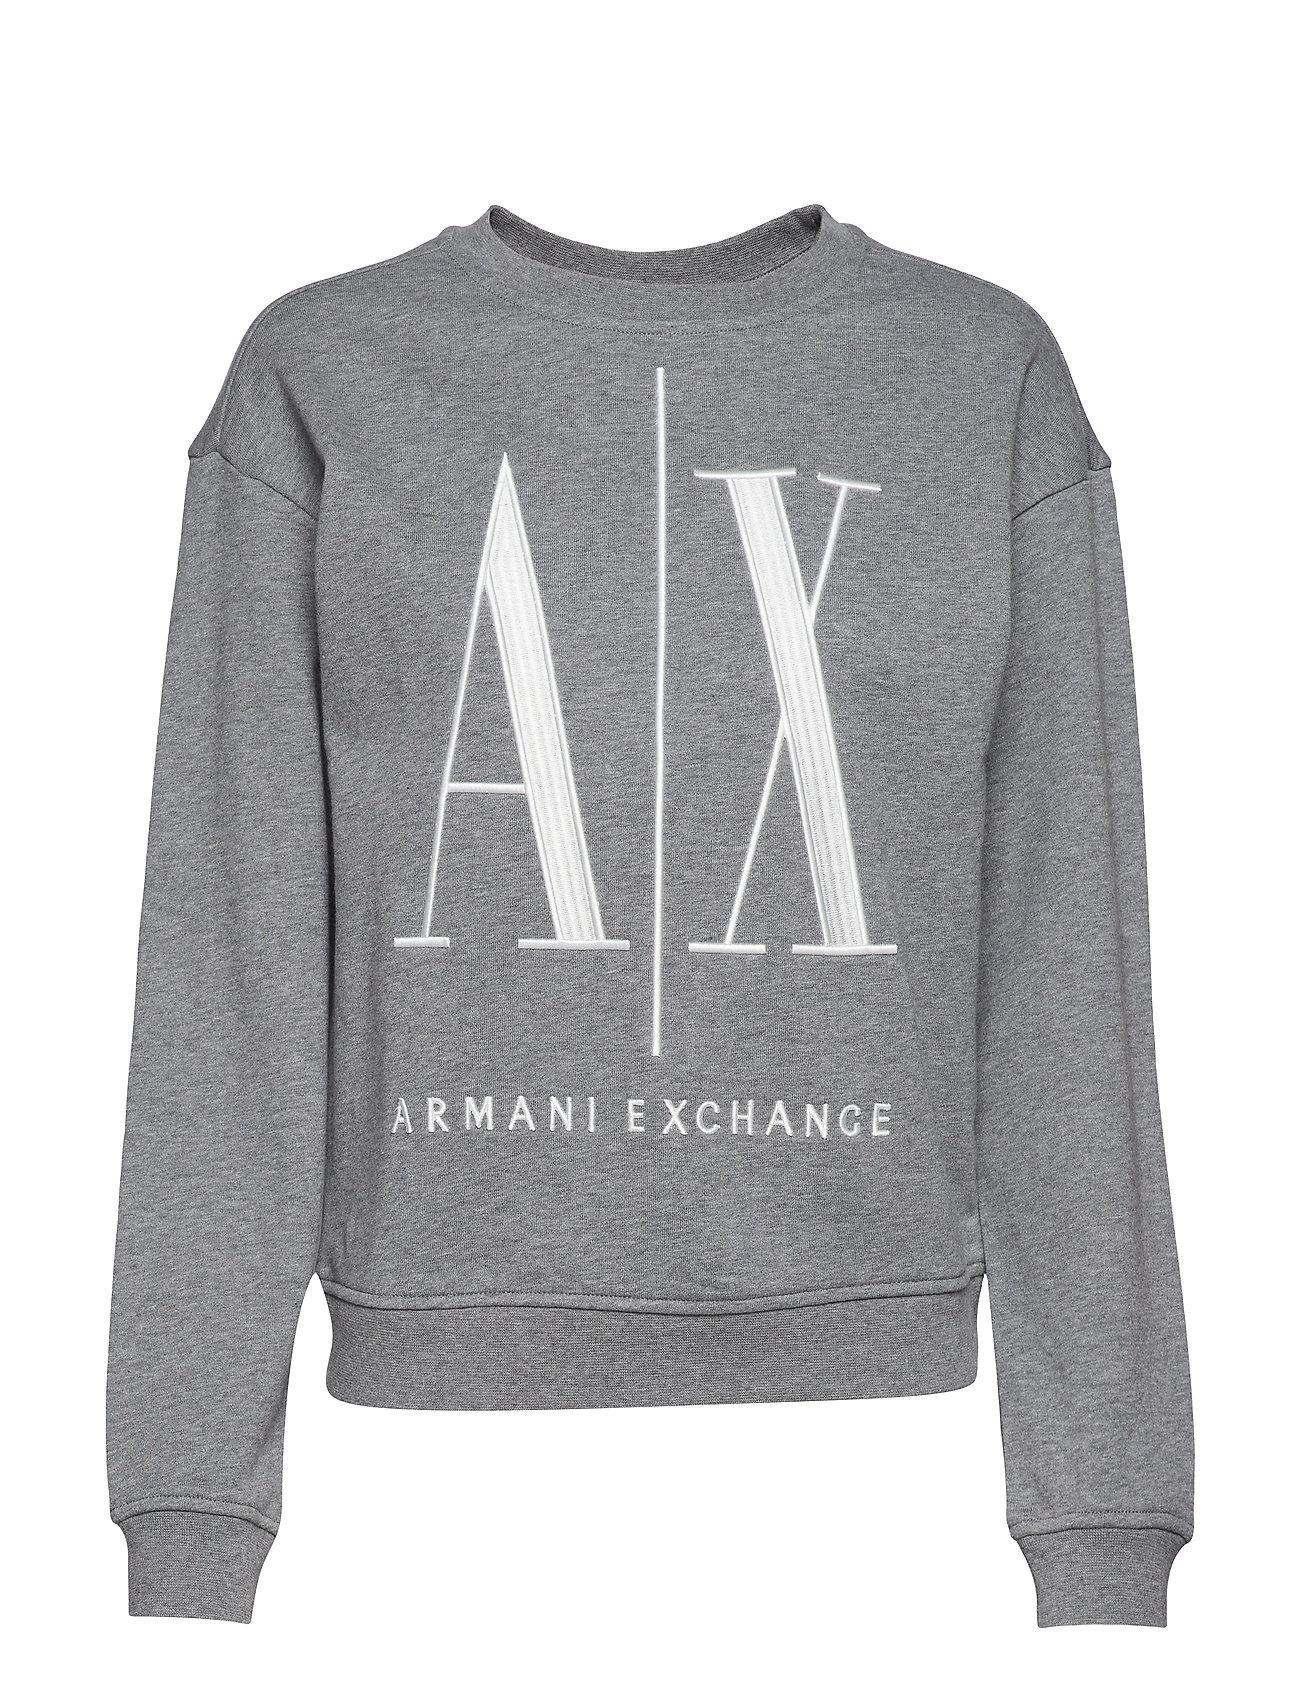 b876943d Ax Woman Sweatshirt (Bc09 Grey) (724 kr) - Armani Exchange - | Boozt.com